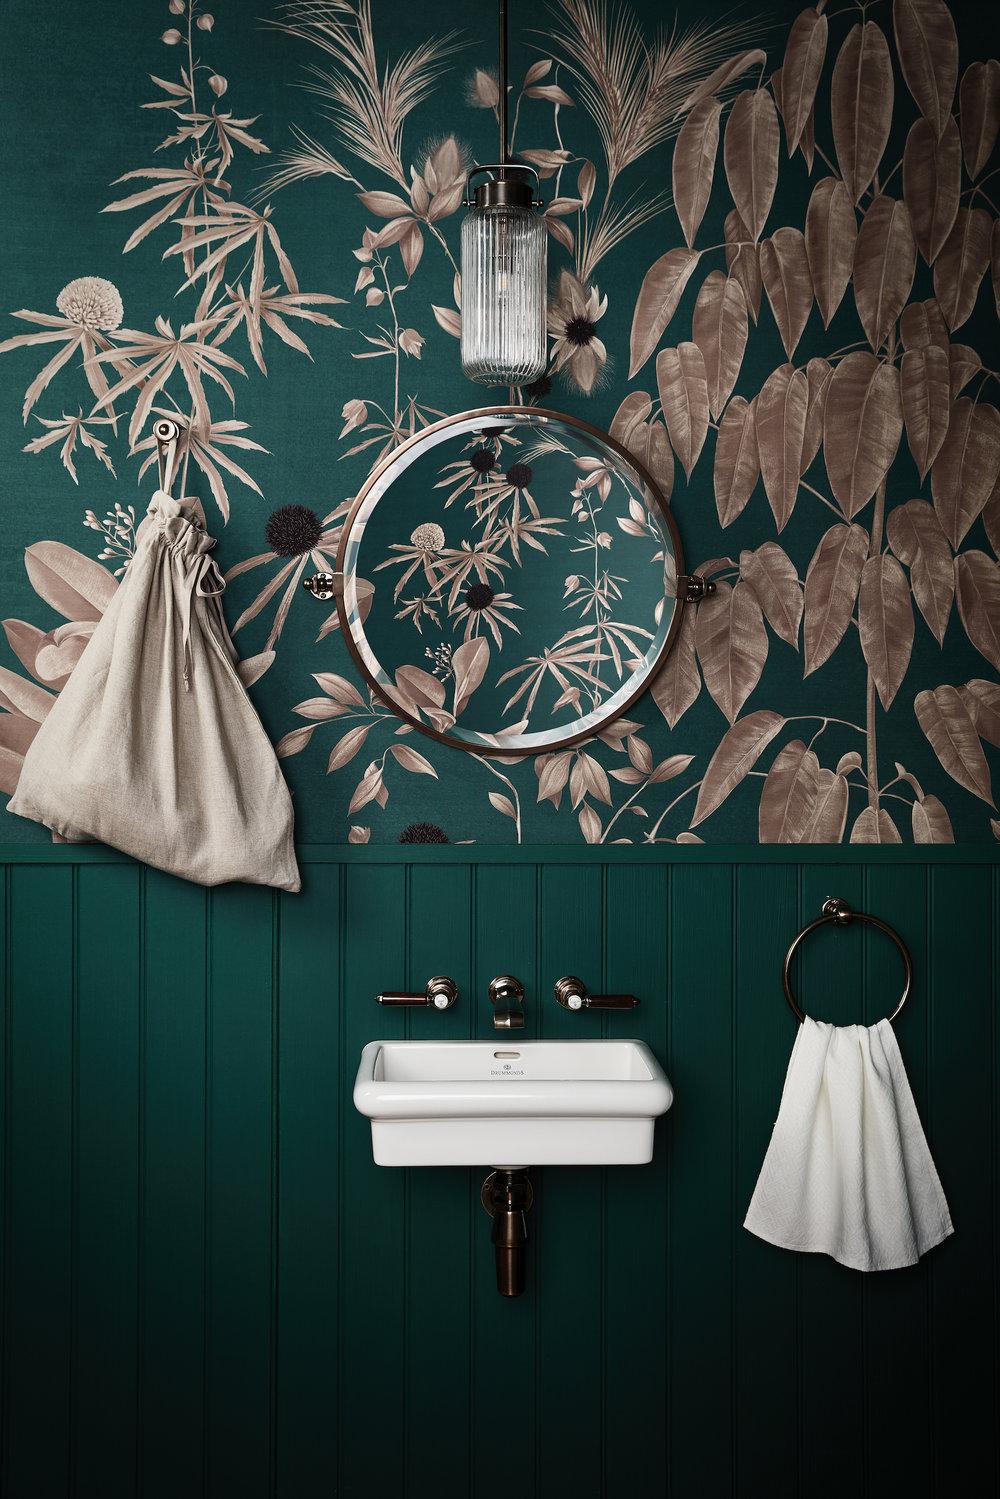 LIV for Interiors / The Green Trend, Drummonds & Benjamin Moore